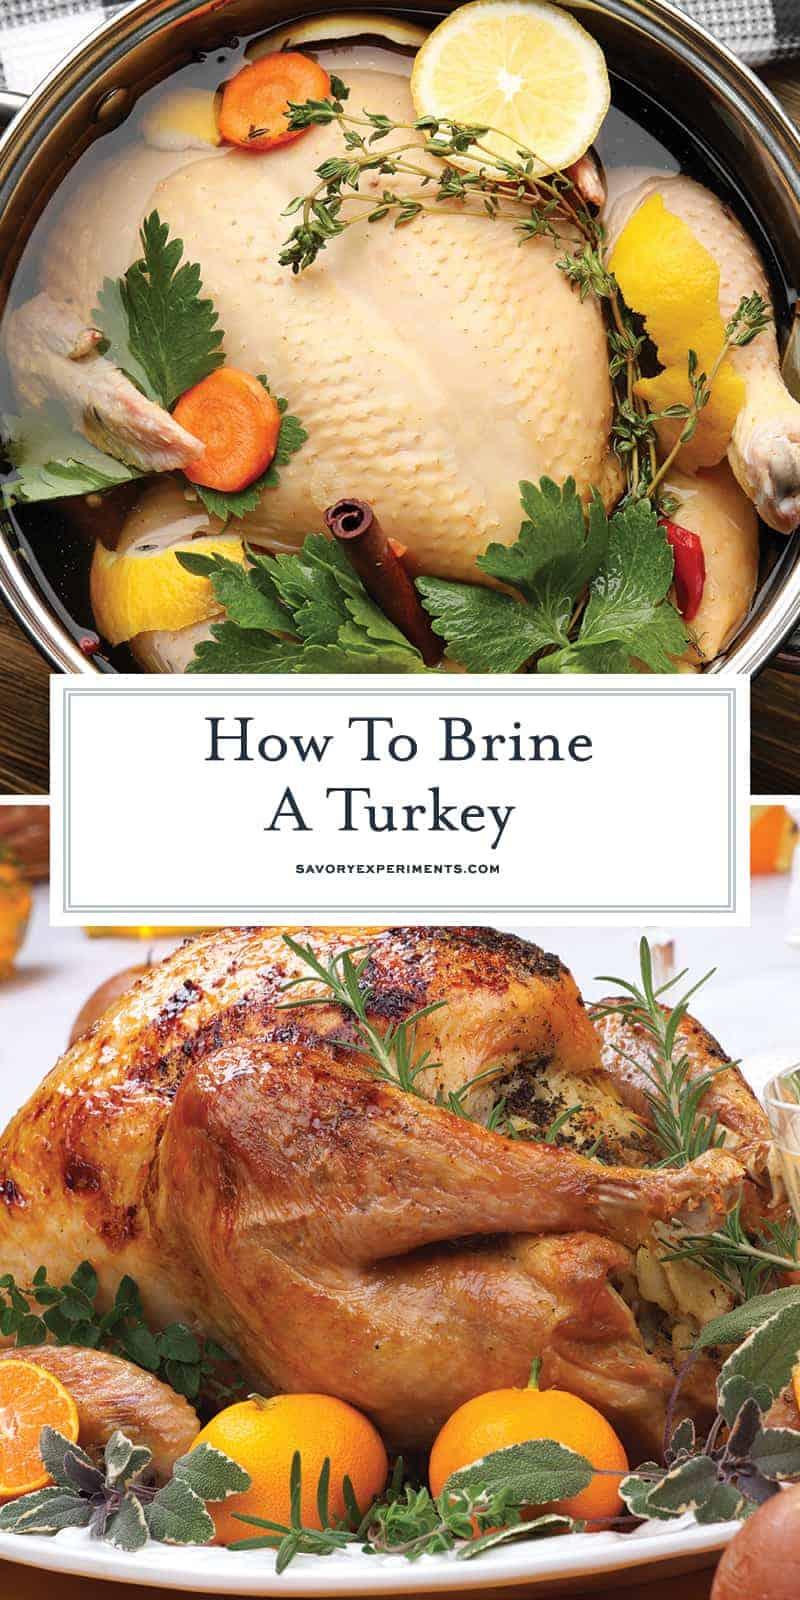 How to Brine a Turkey- a step-by-step guide for brining turkey, tips for a better turkey, how to brown turkey skin and a recipe for juicy turkey. #turkeybrinerecipe #thanksgivingturkeyrecipe www.savoryexperiments.com